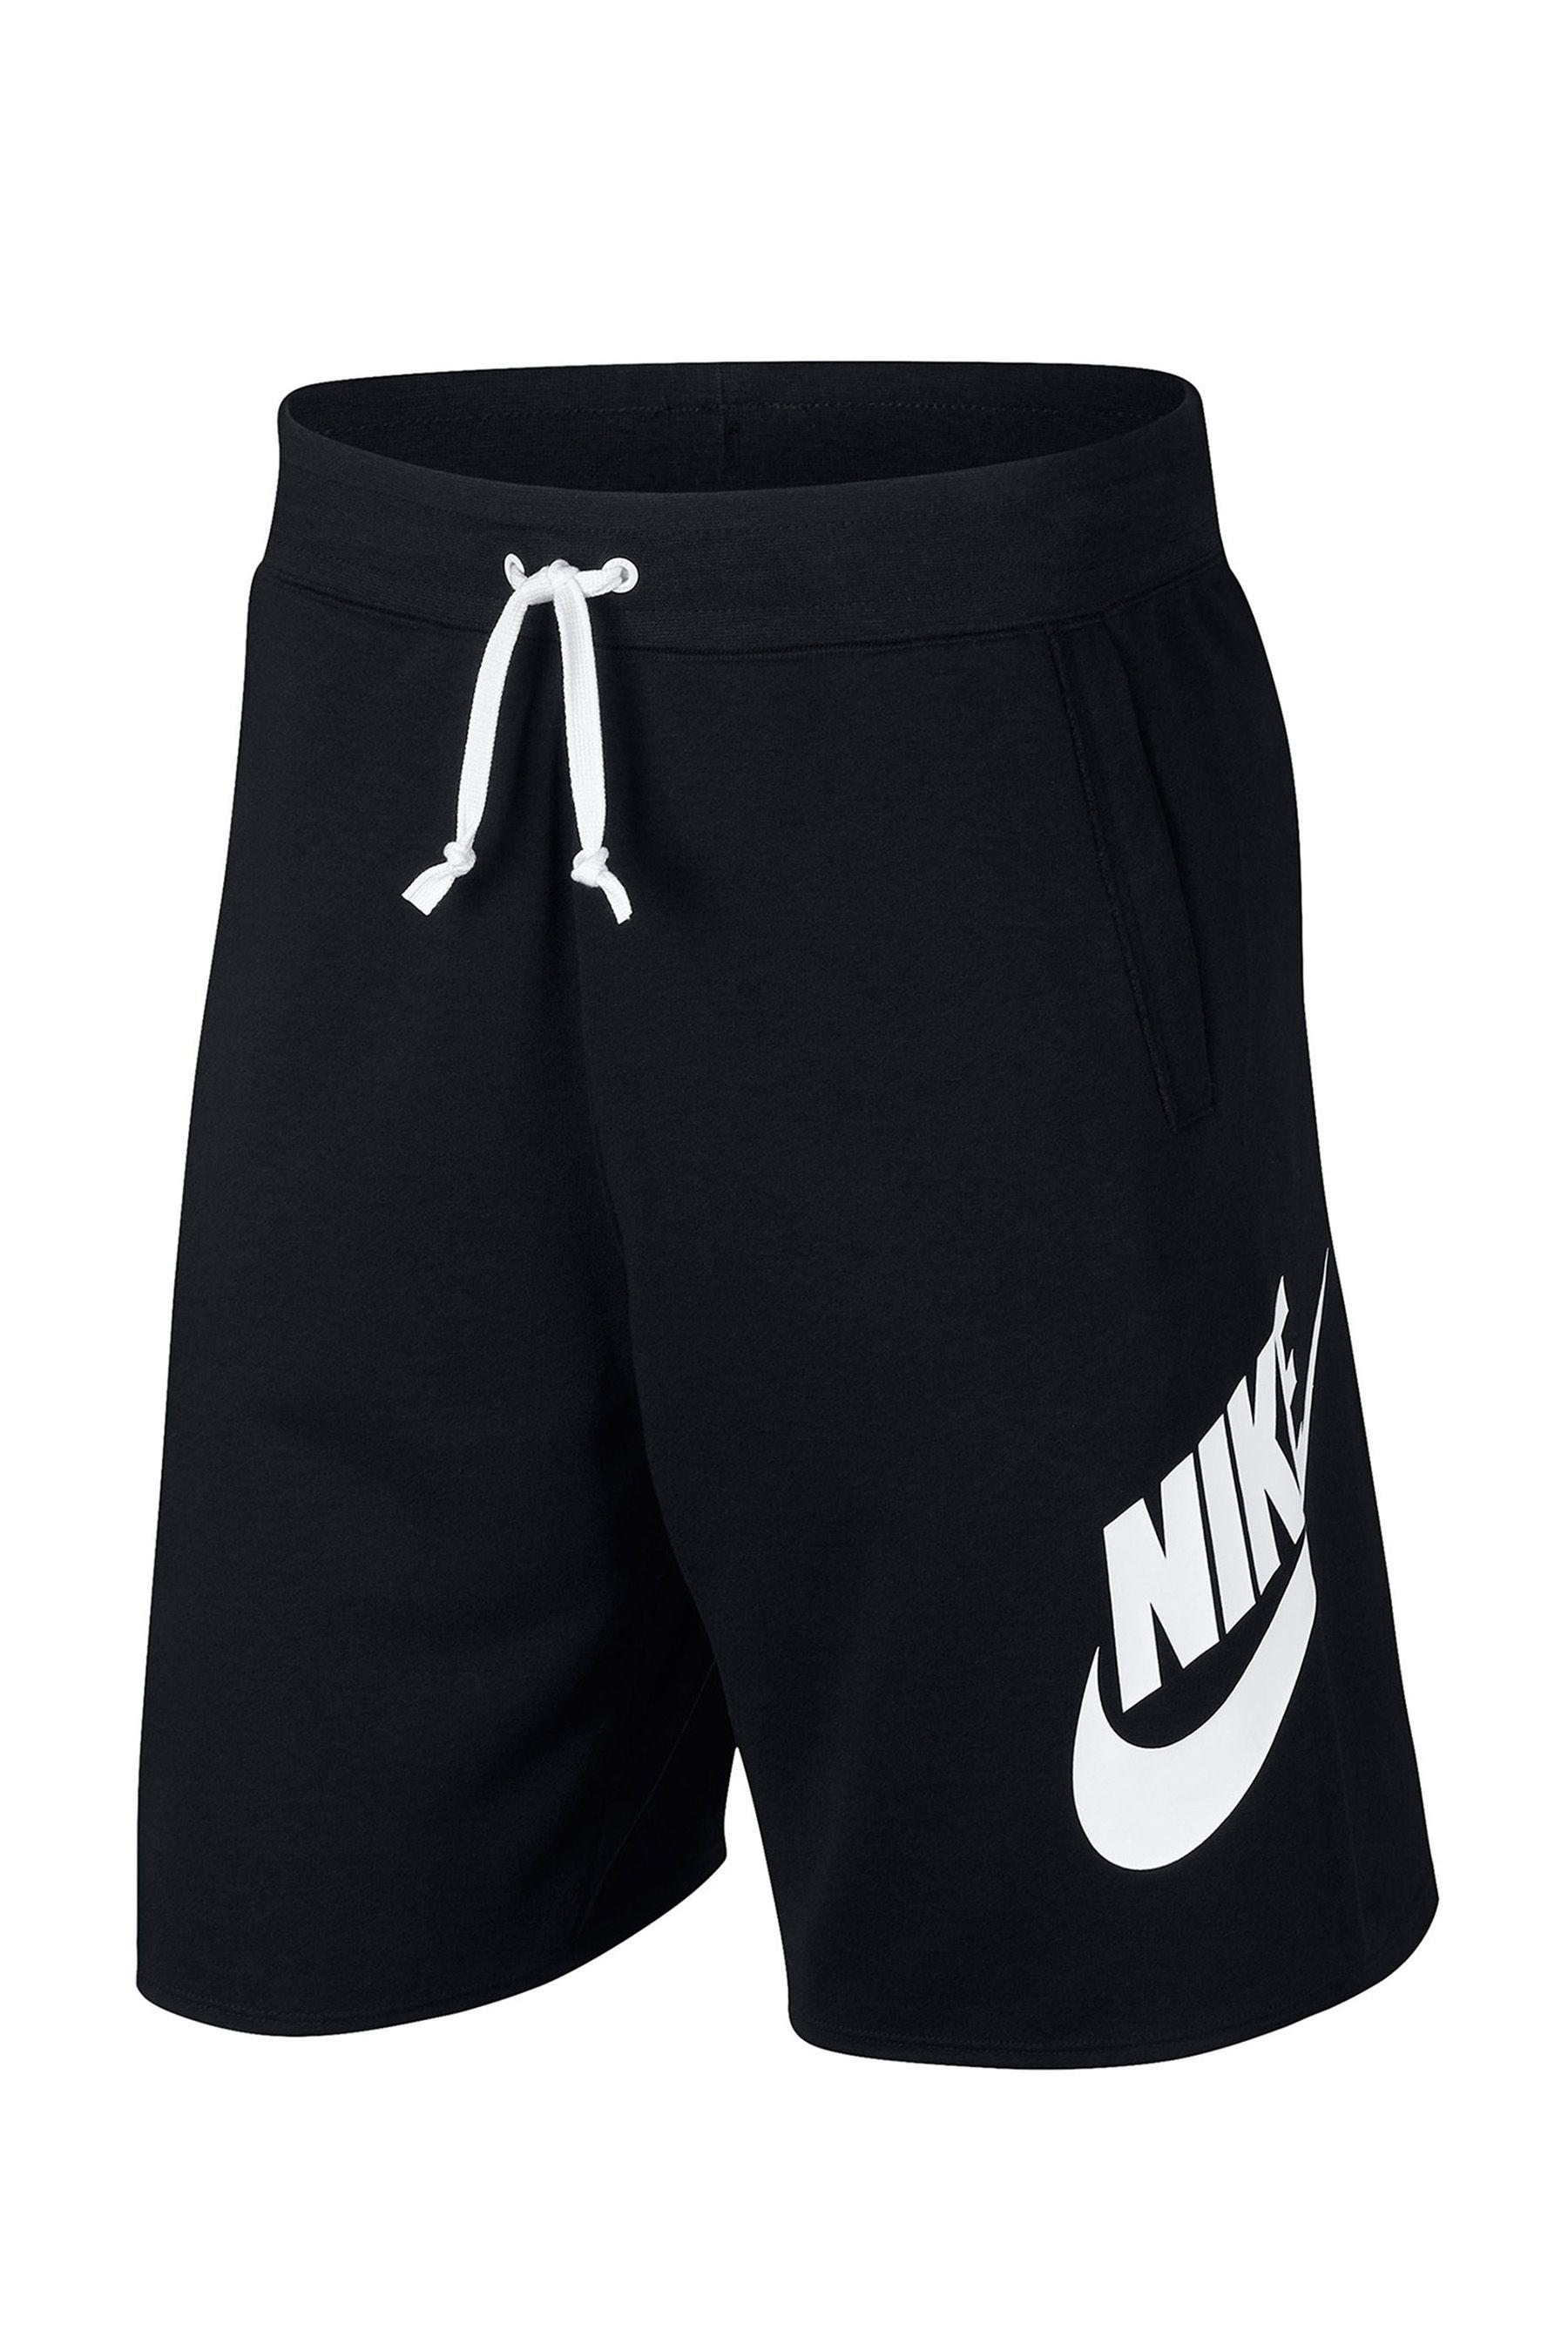 Nike Alumni Short in 2020 | Nike shorts mens, Nike shorts